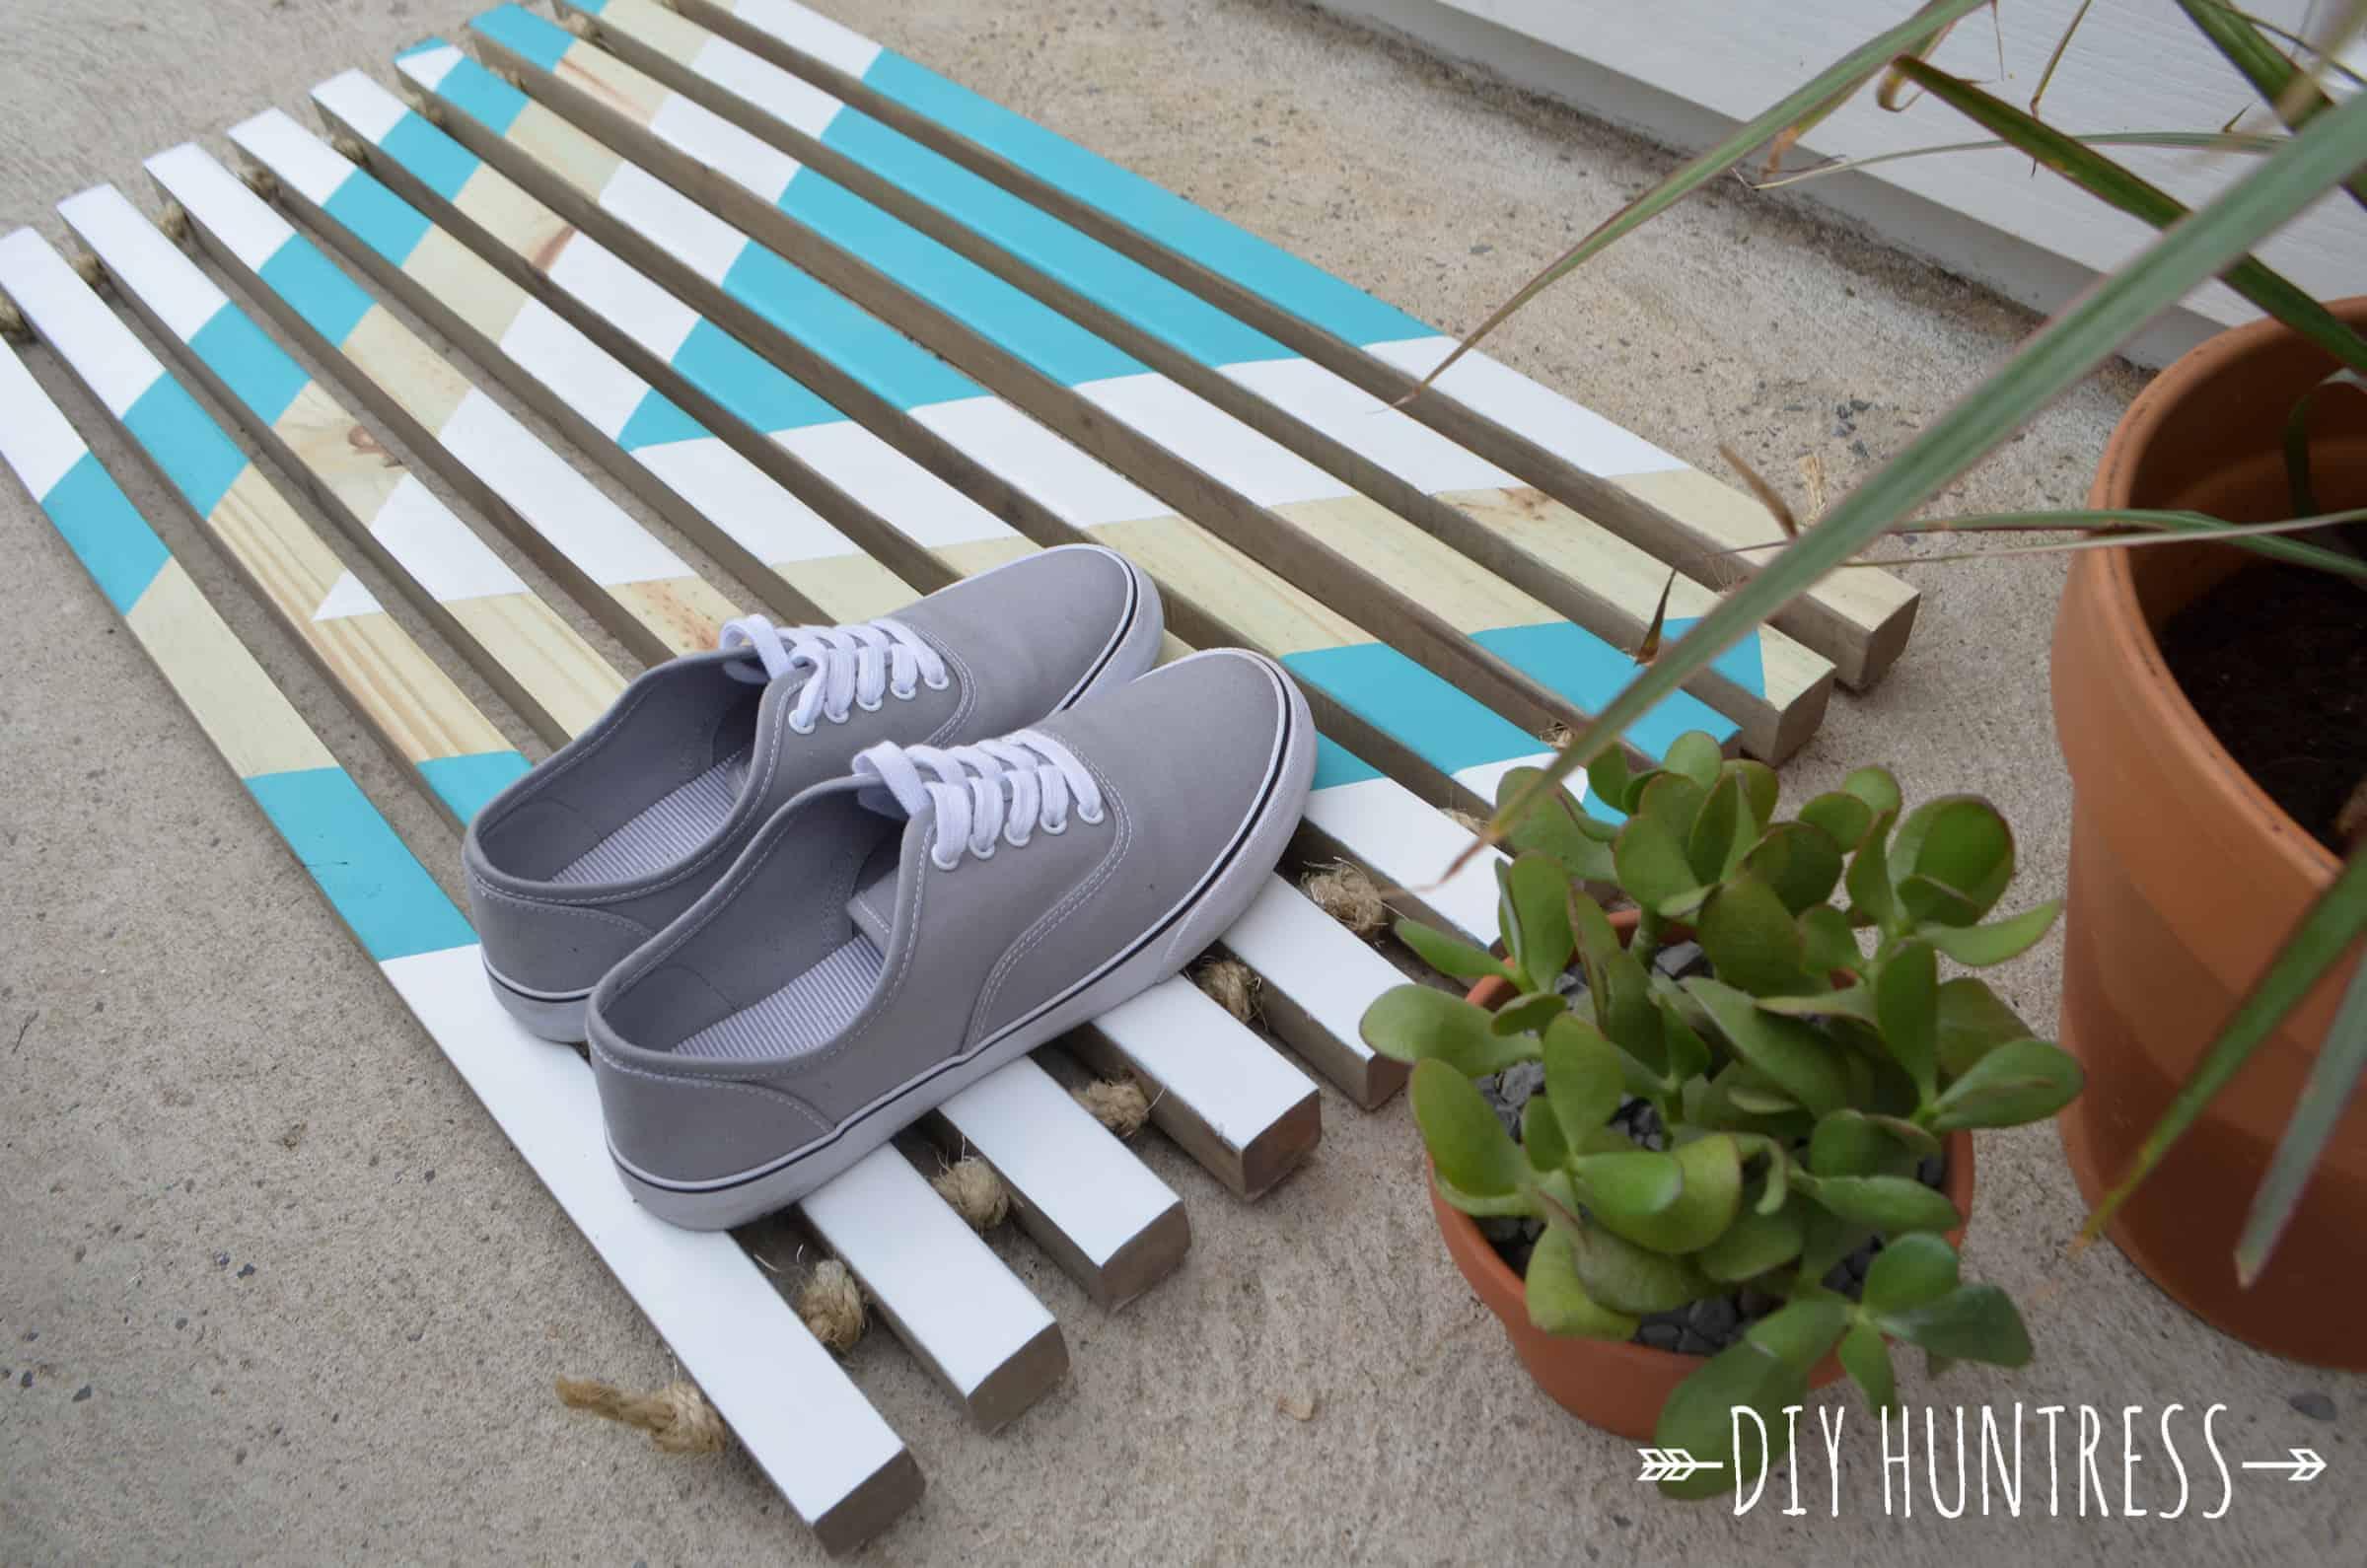 DIY_Huntress_Doormat_Home_Depot-19